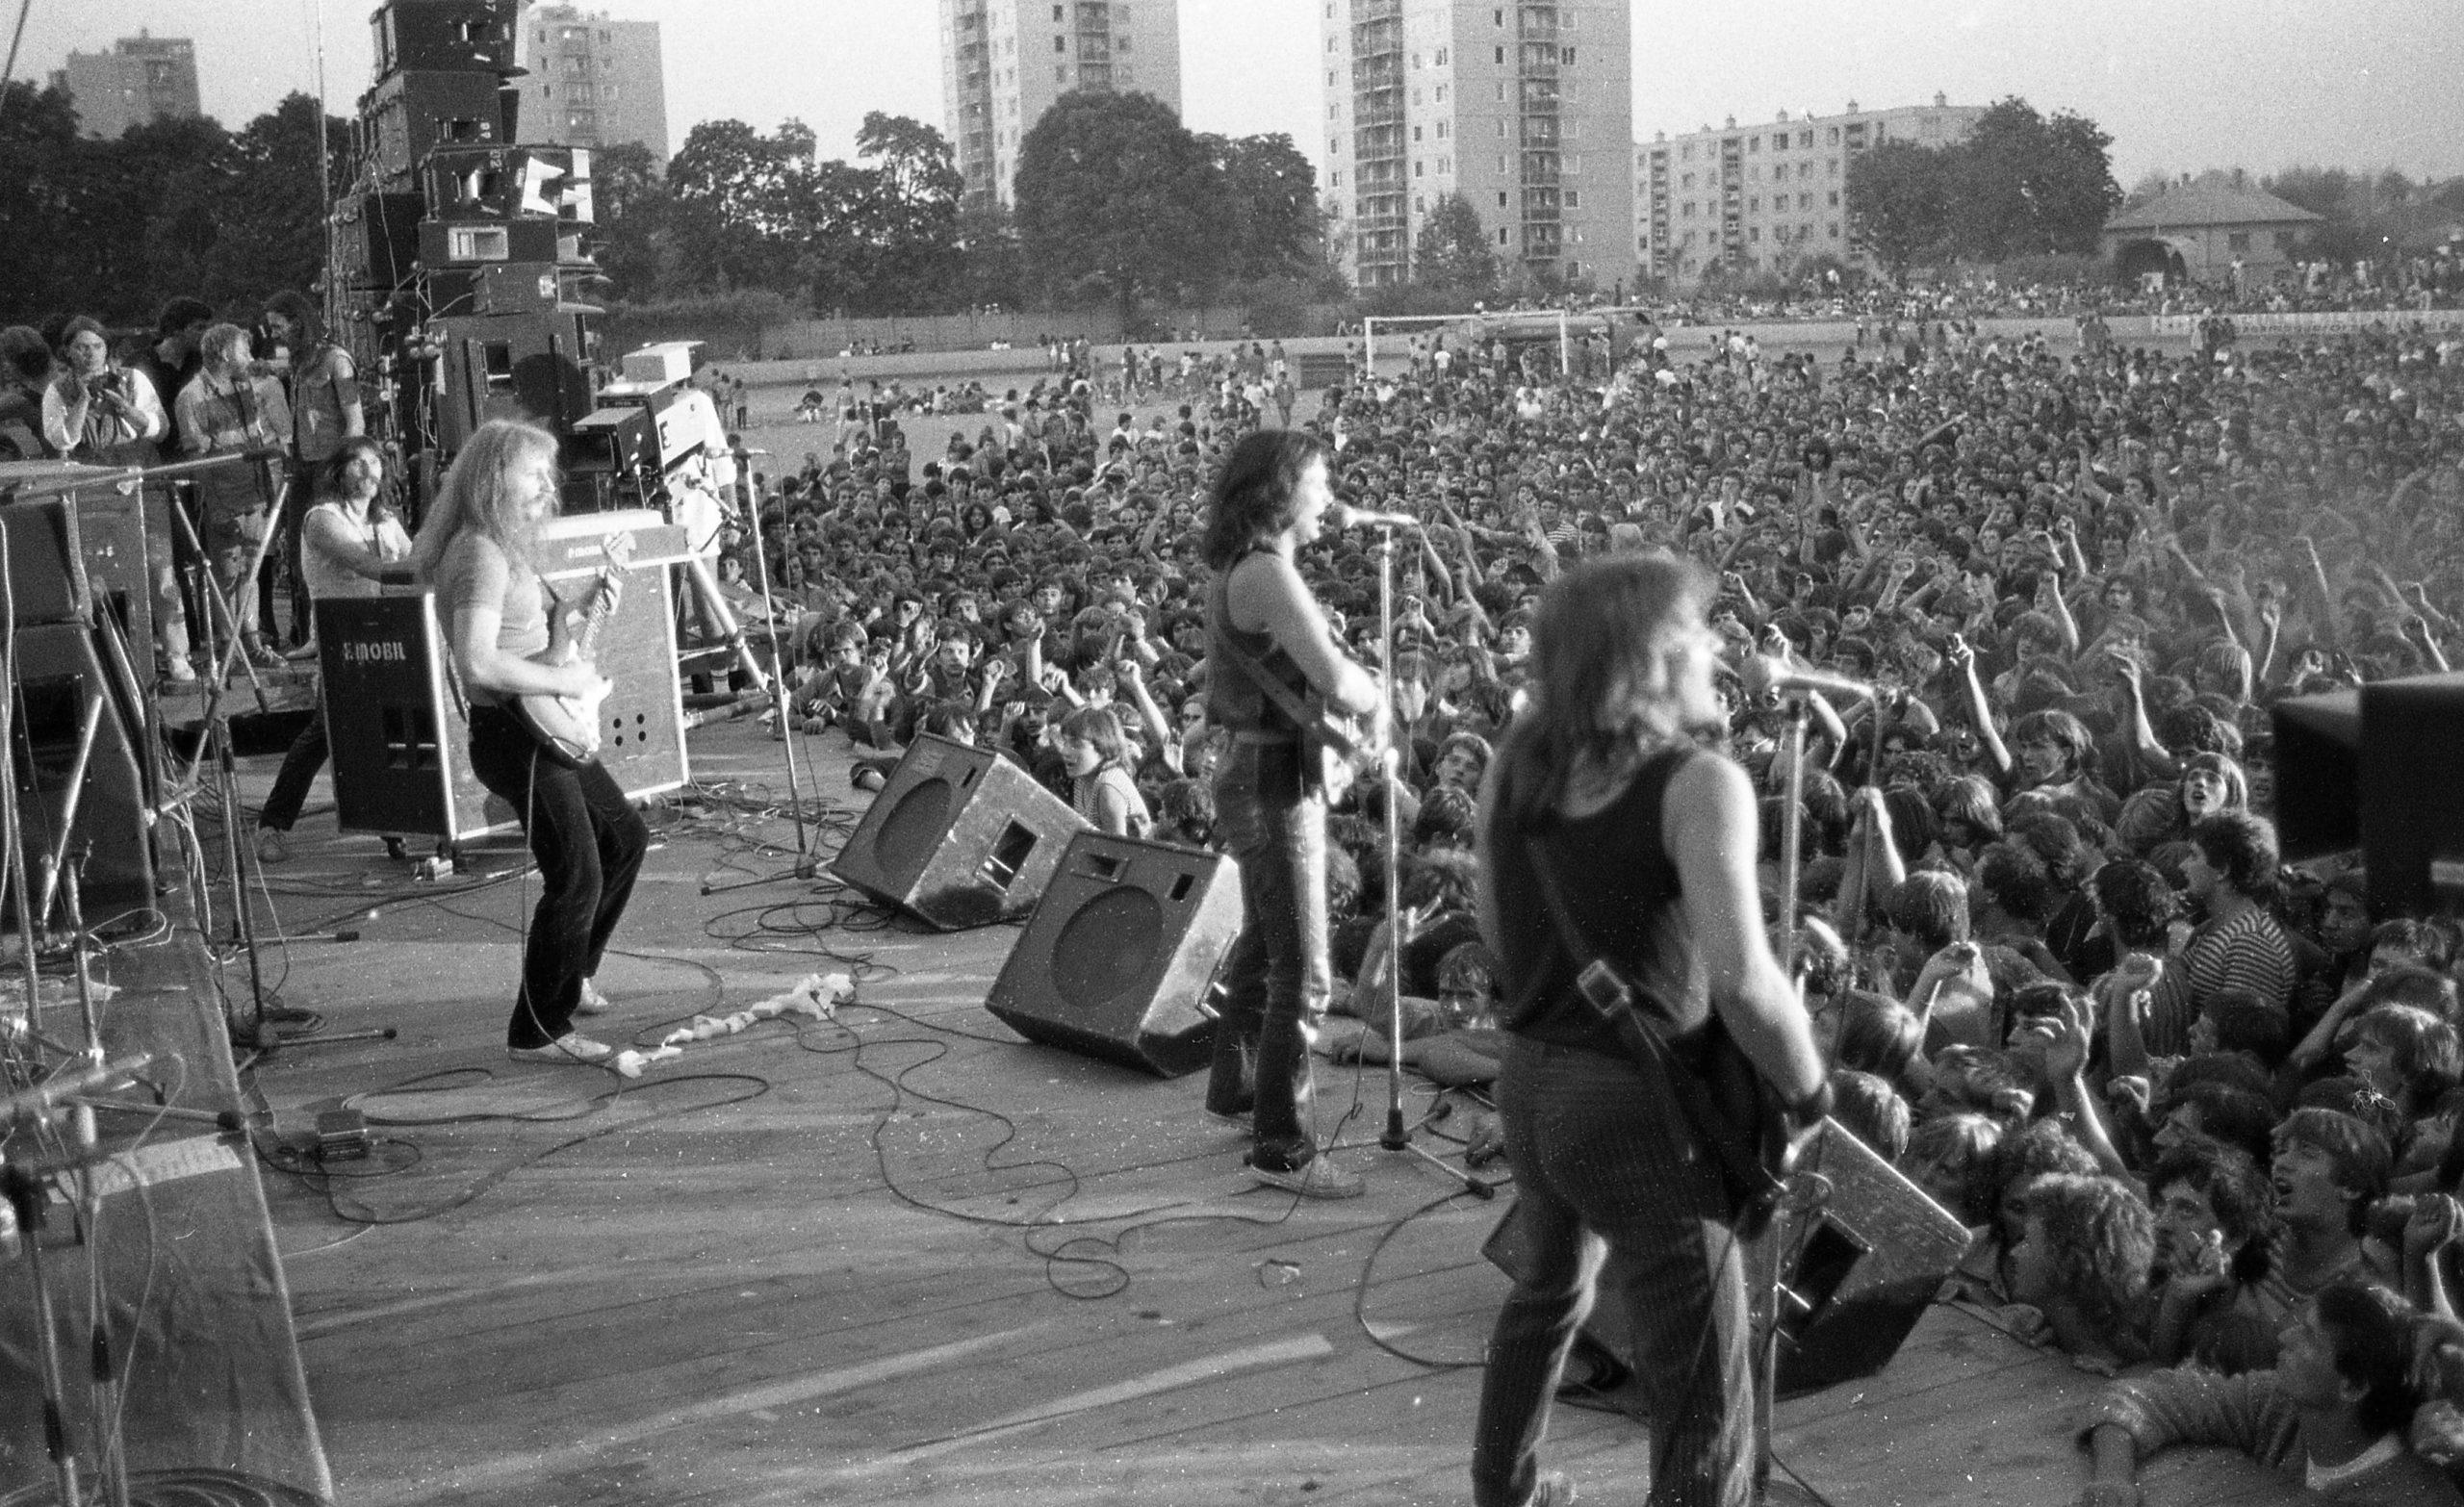 1983, P. Mobil / Fotó: Urbán Tamás (Fortepan.hu)